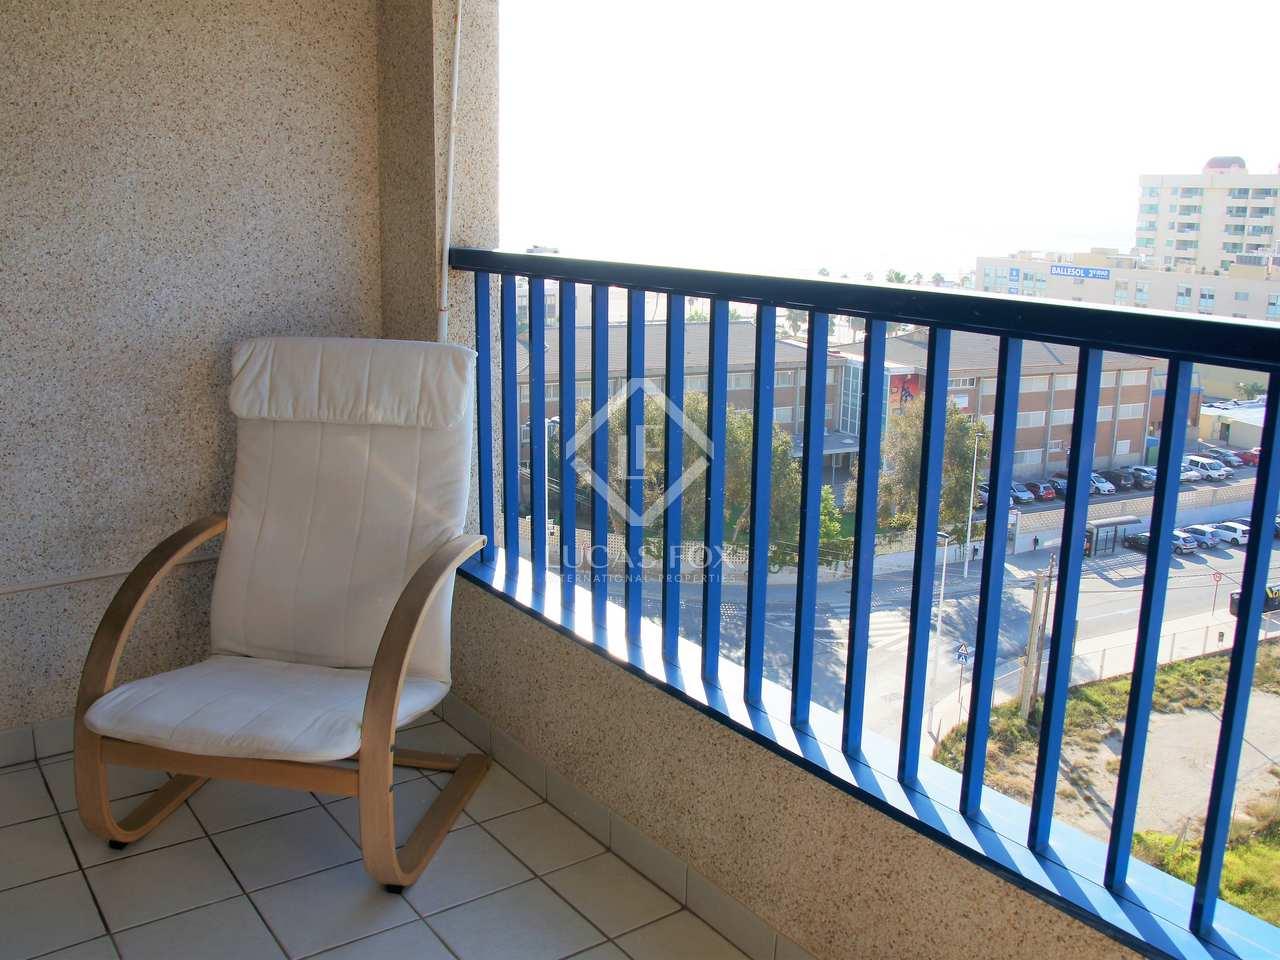 Apartamento de 70m con terraza en alquiler en la patacona for Piscina patacona